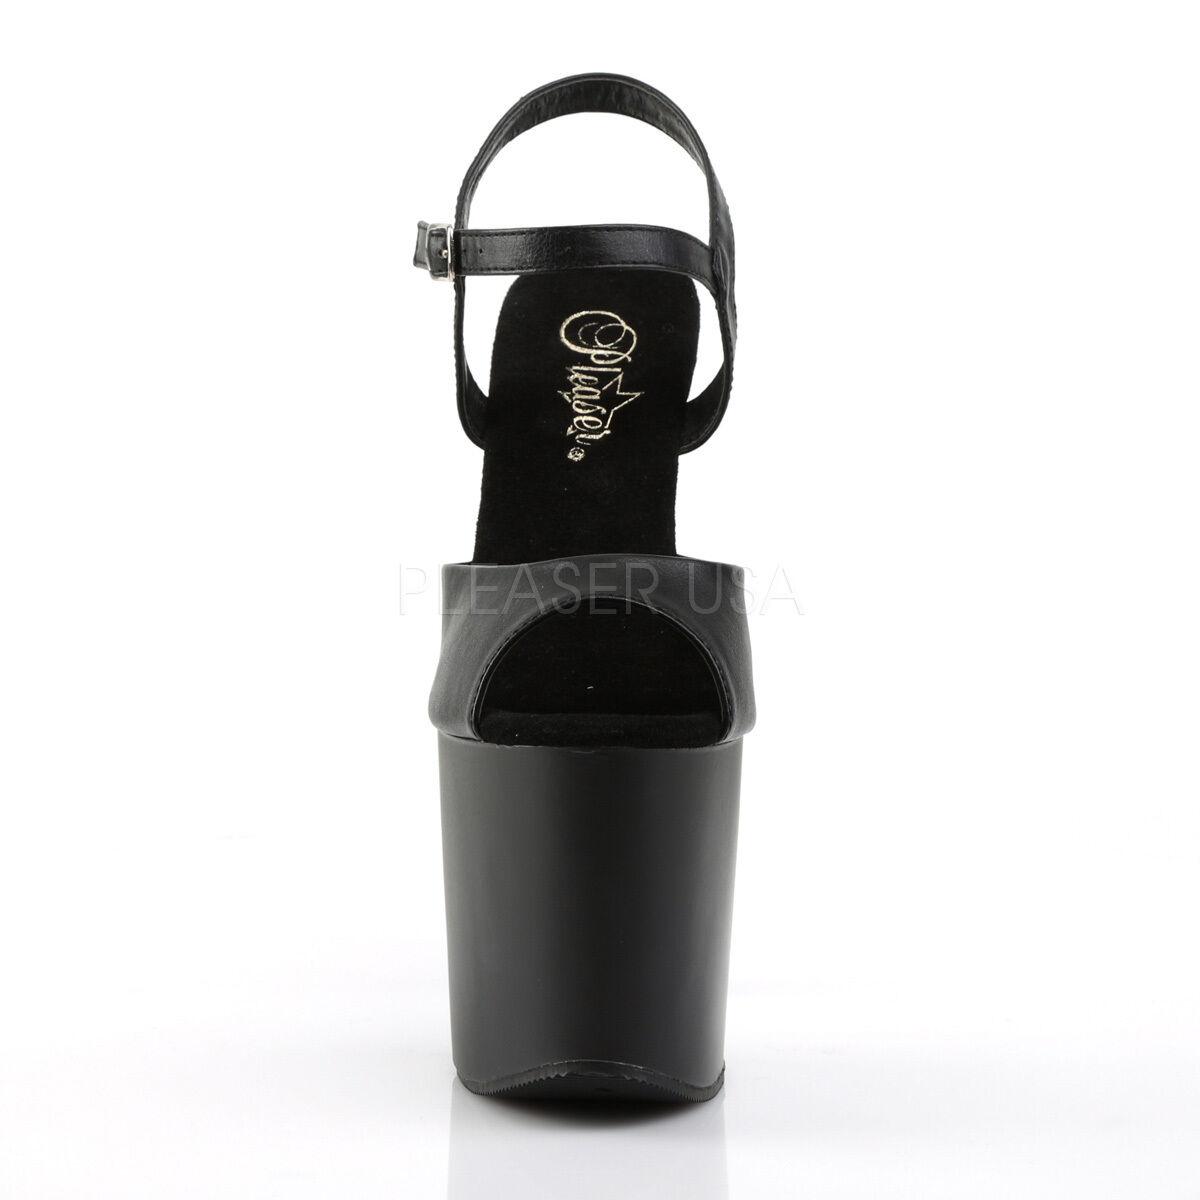 PLEASER TAB709 BPU M Sexy Platform Black Faux Leather 7.5 7.5 7.5  Stripper Heels shoes c4e816